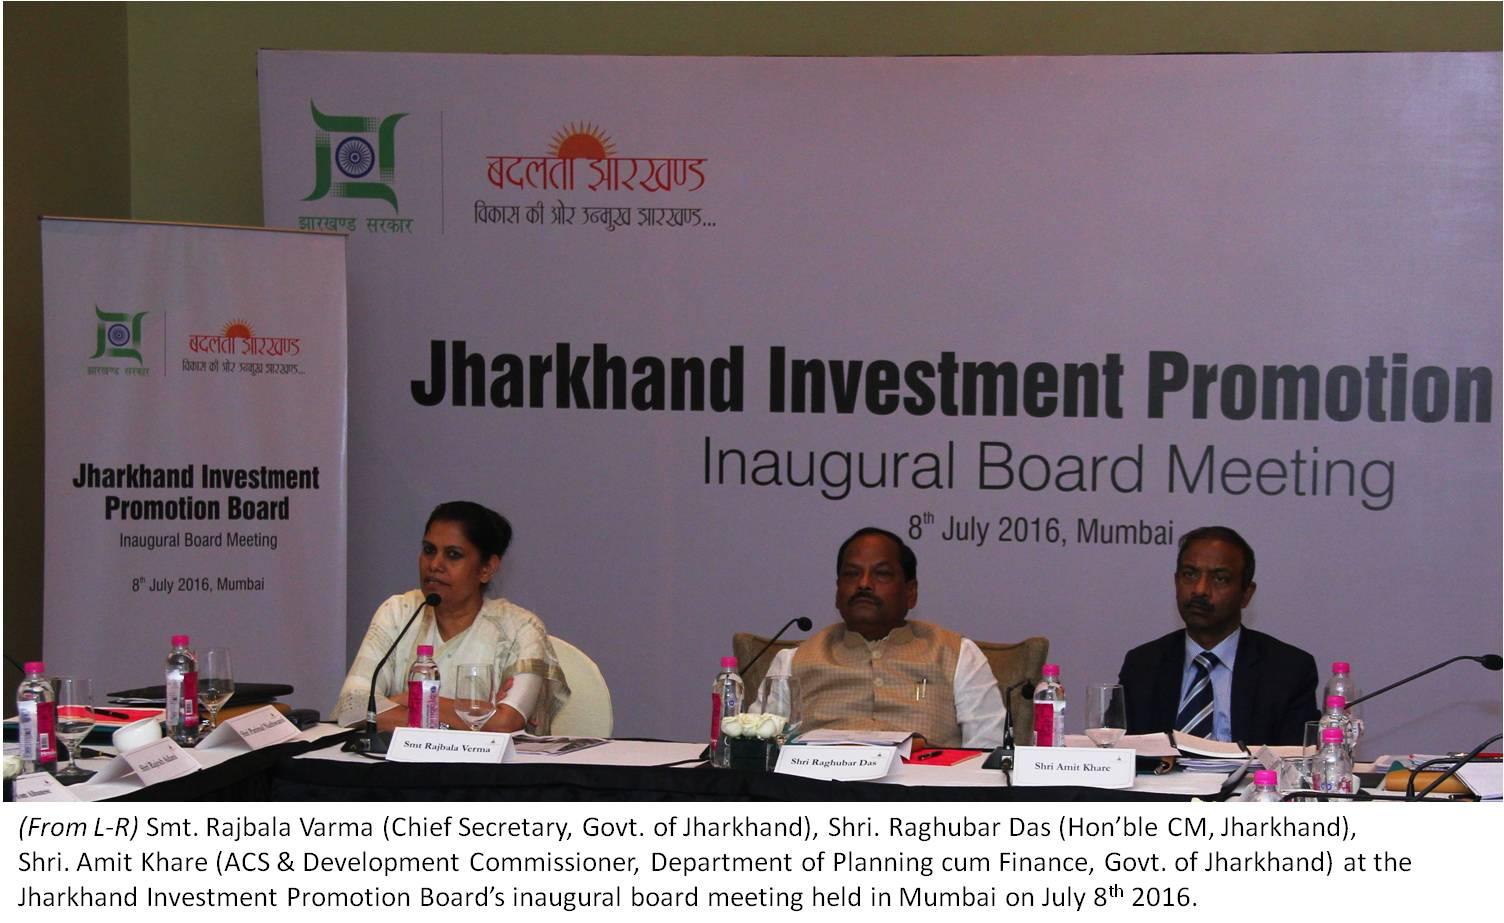 JIPB Mumbai Picture 1.png